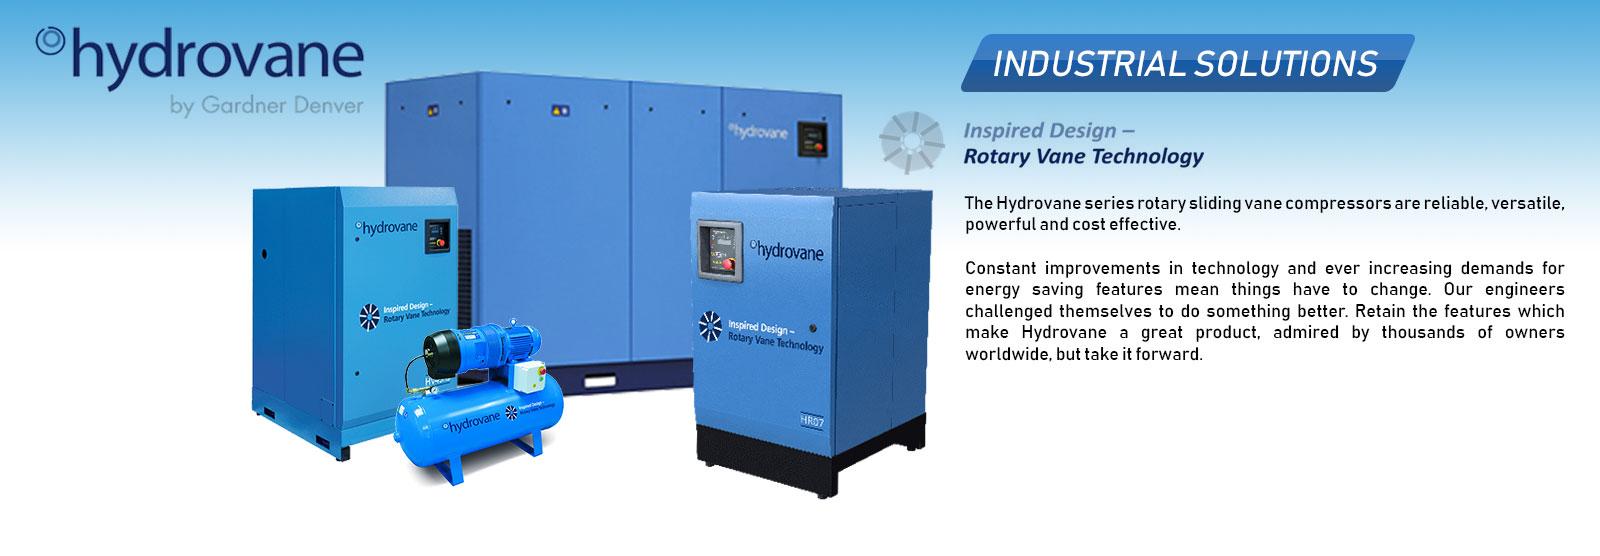 Hydrovane Series